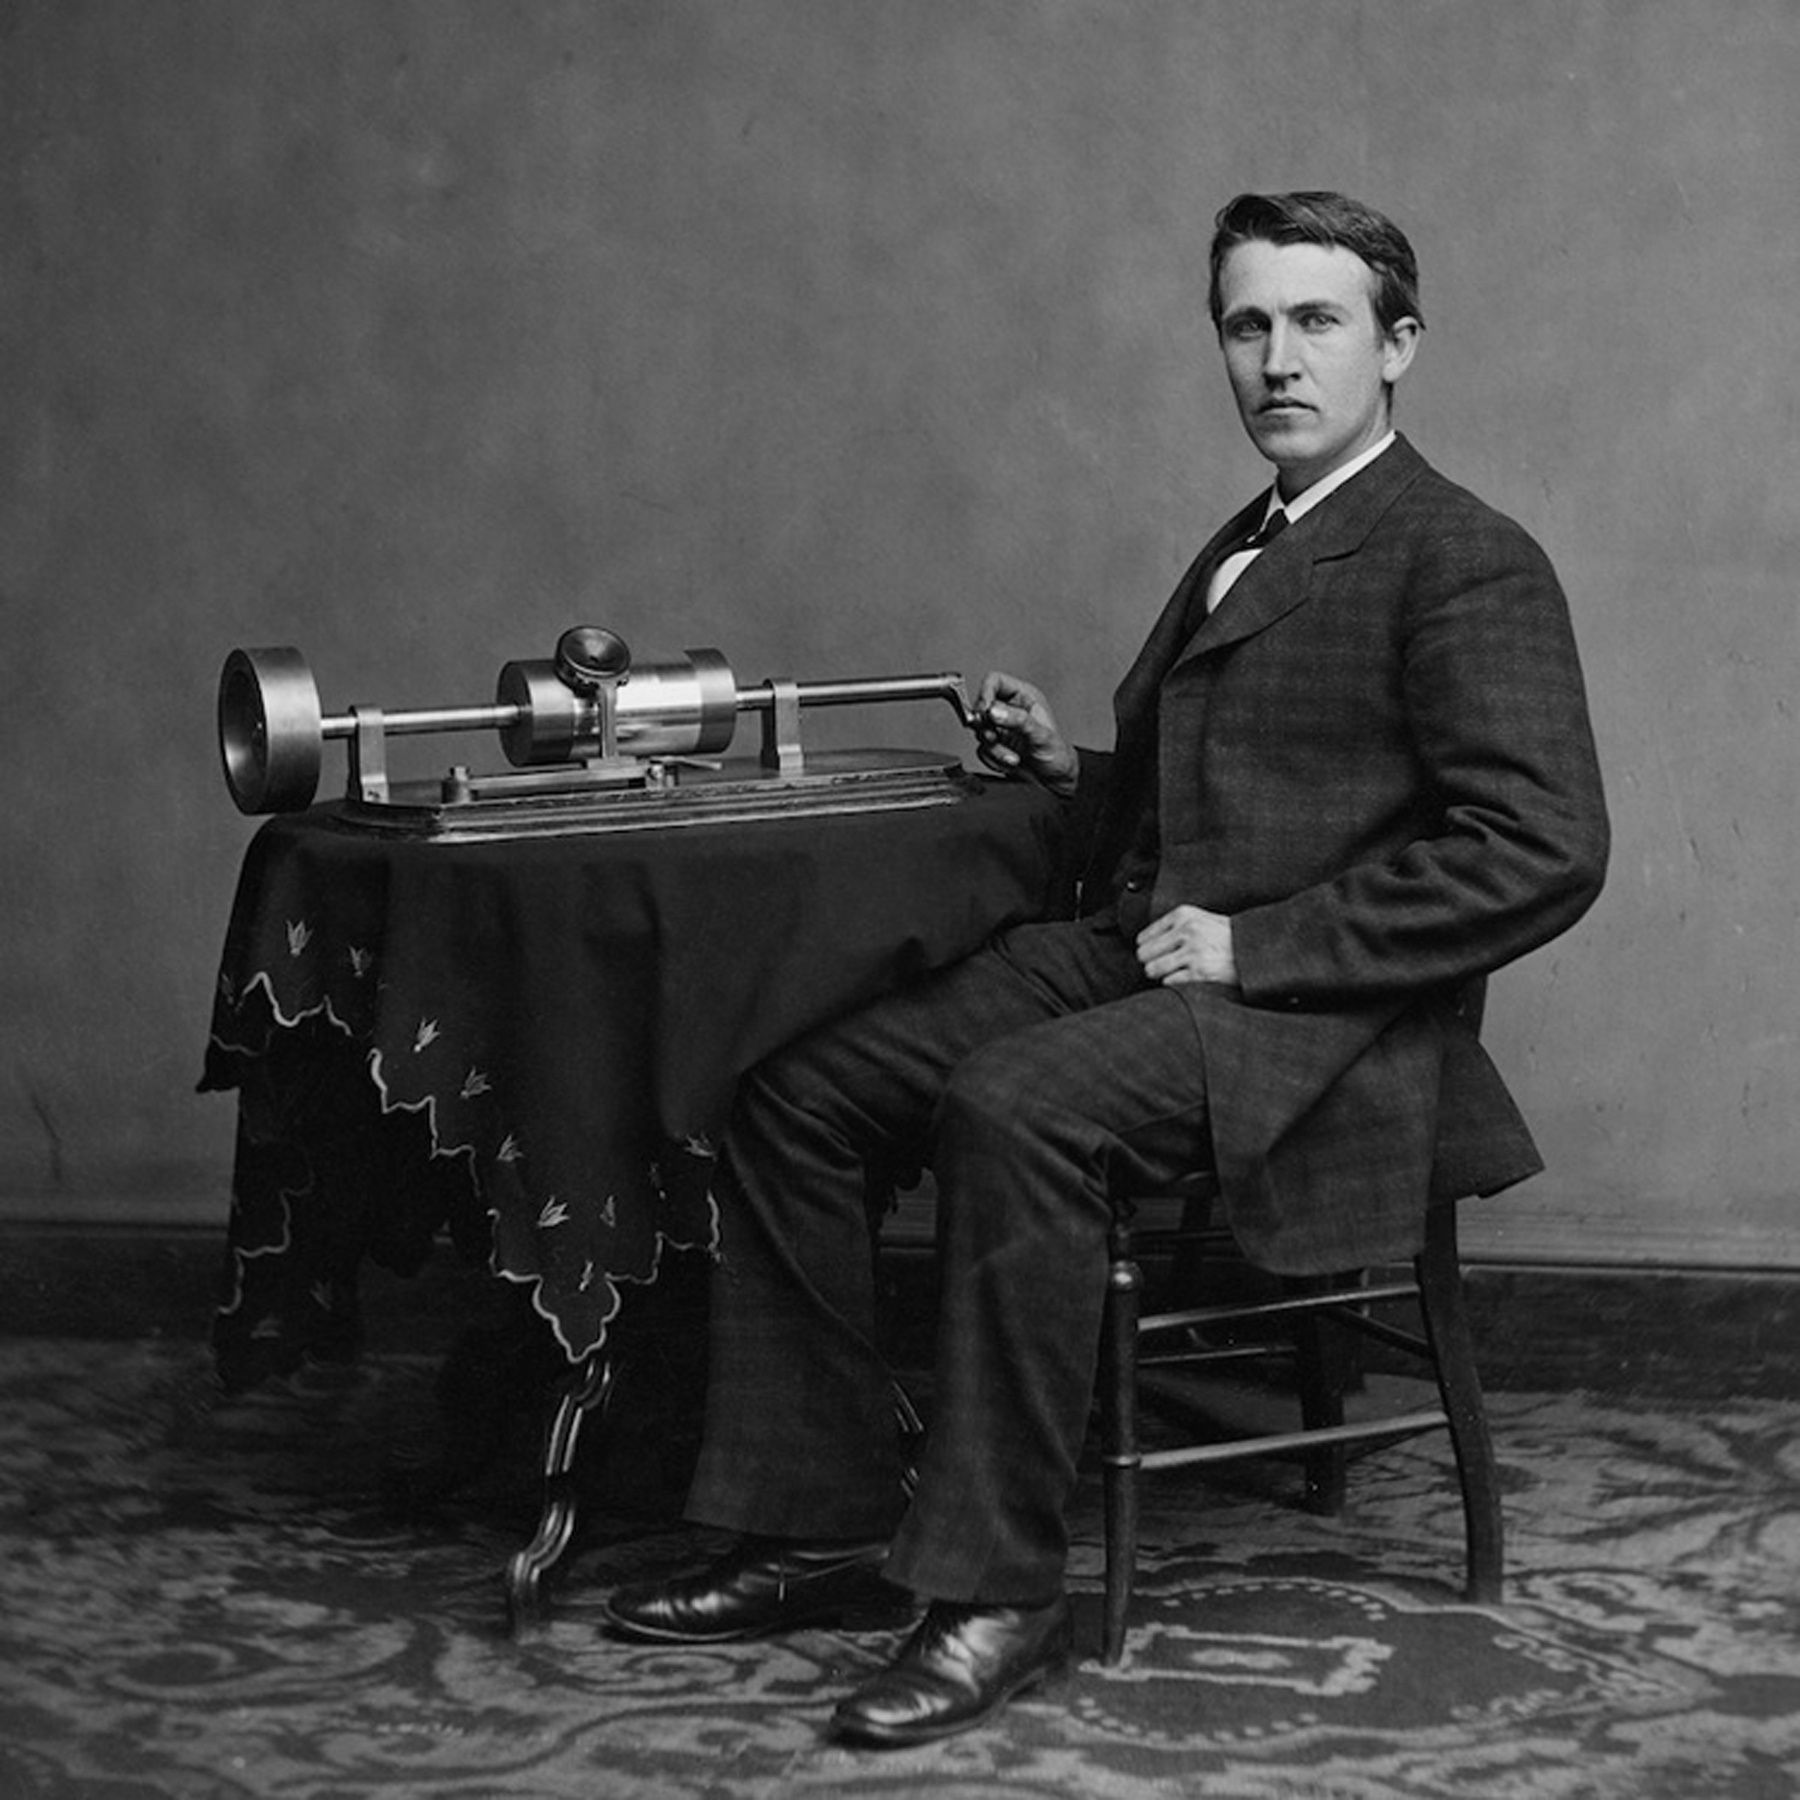 Thomas-Edison-phonograph-free-image-from-Wikipedia.jpg